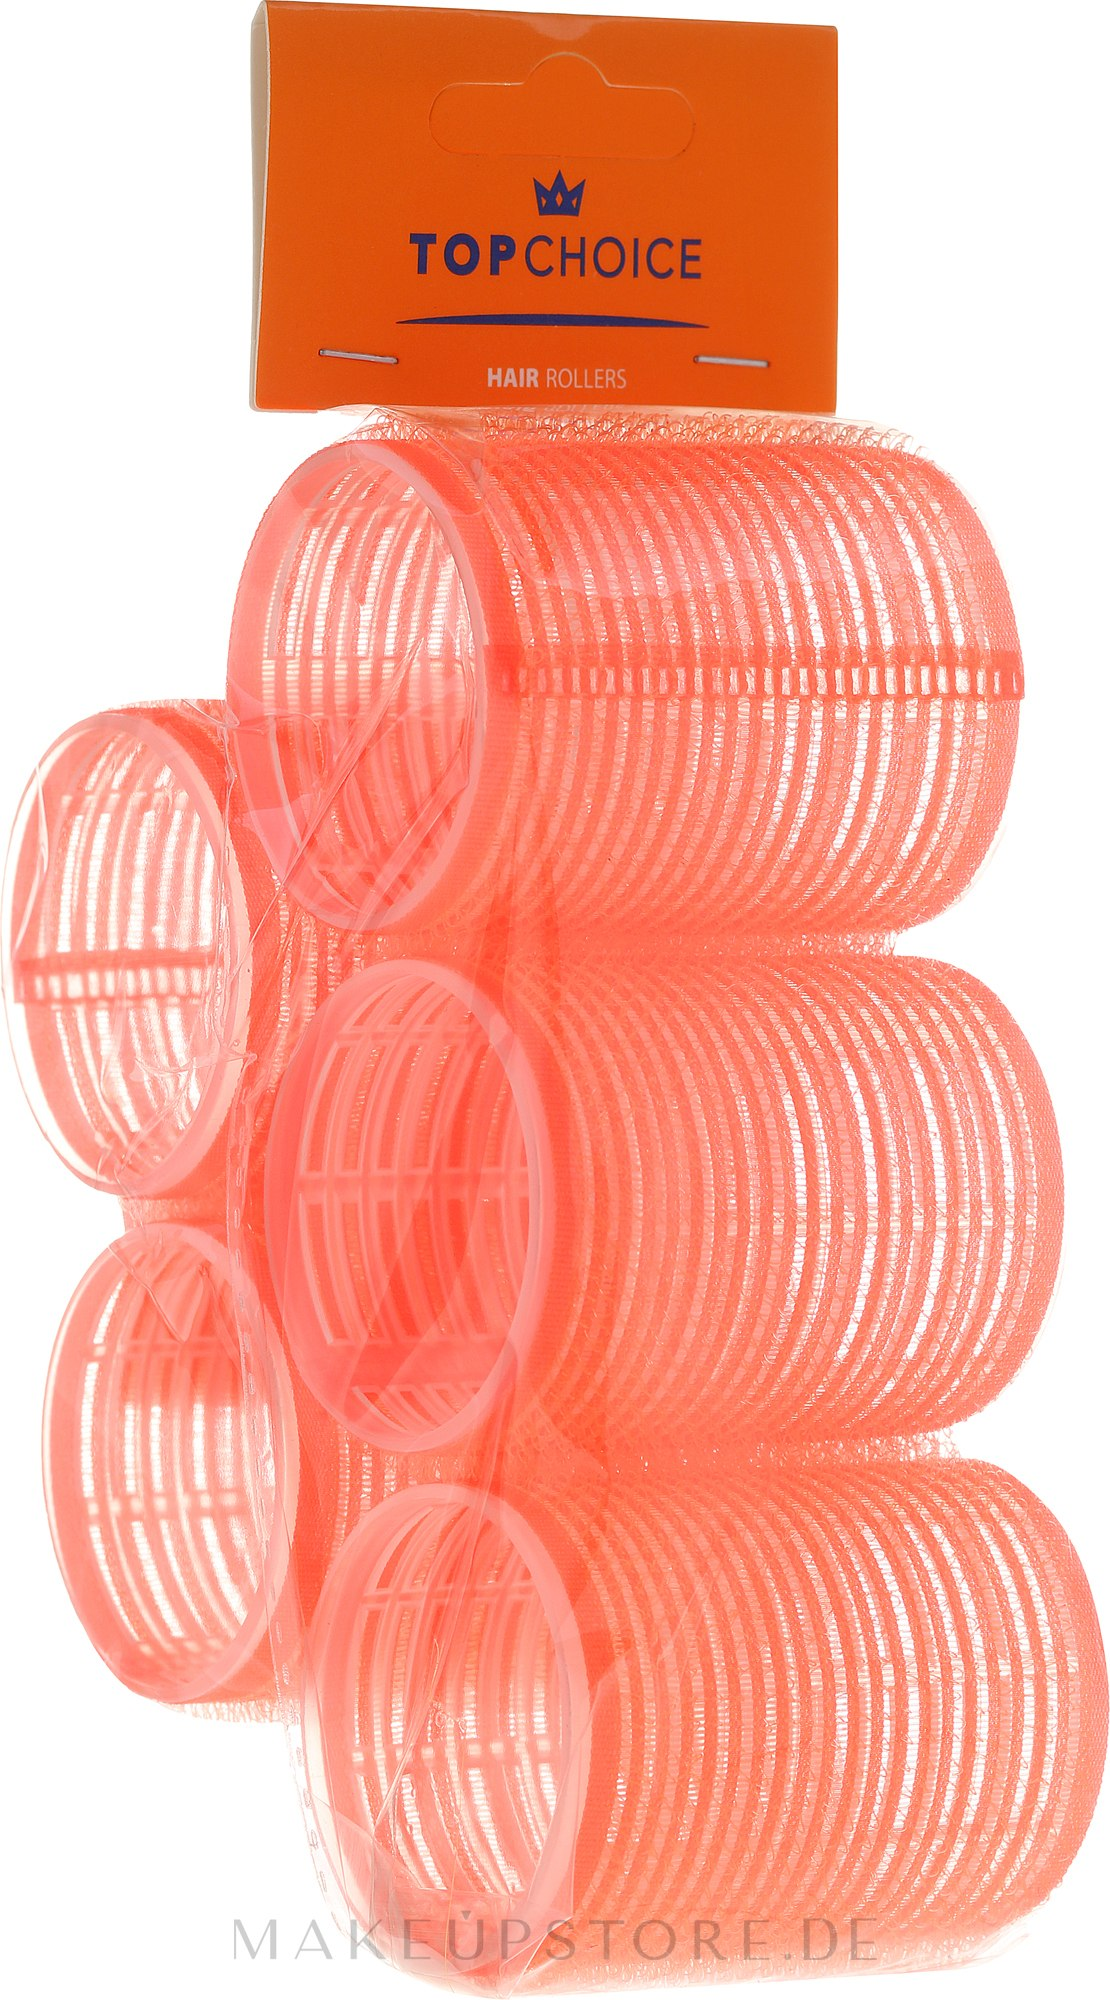 Klettwickler 0478 47 mm 5 St. - Top Choice Velcro — Bild 5 St..